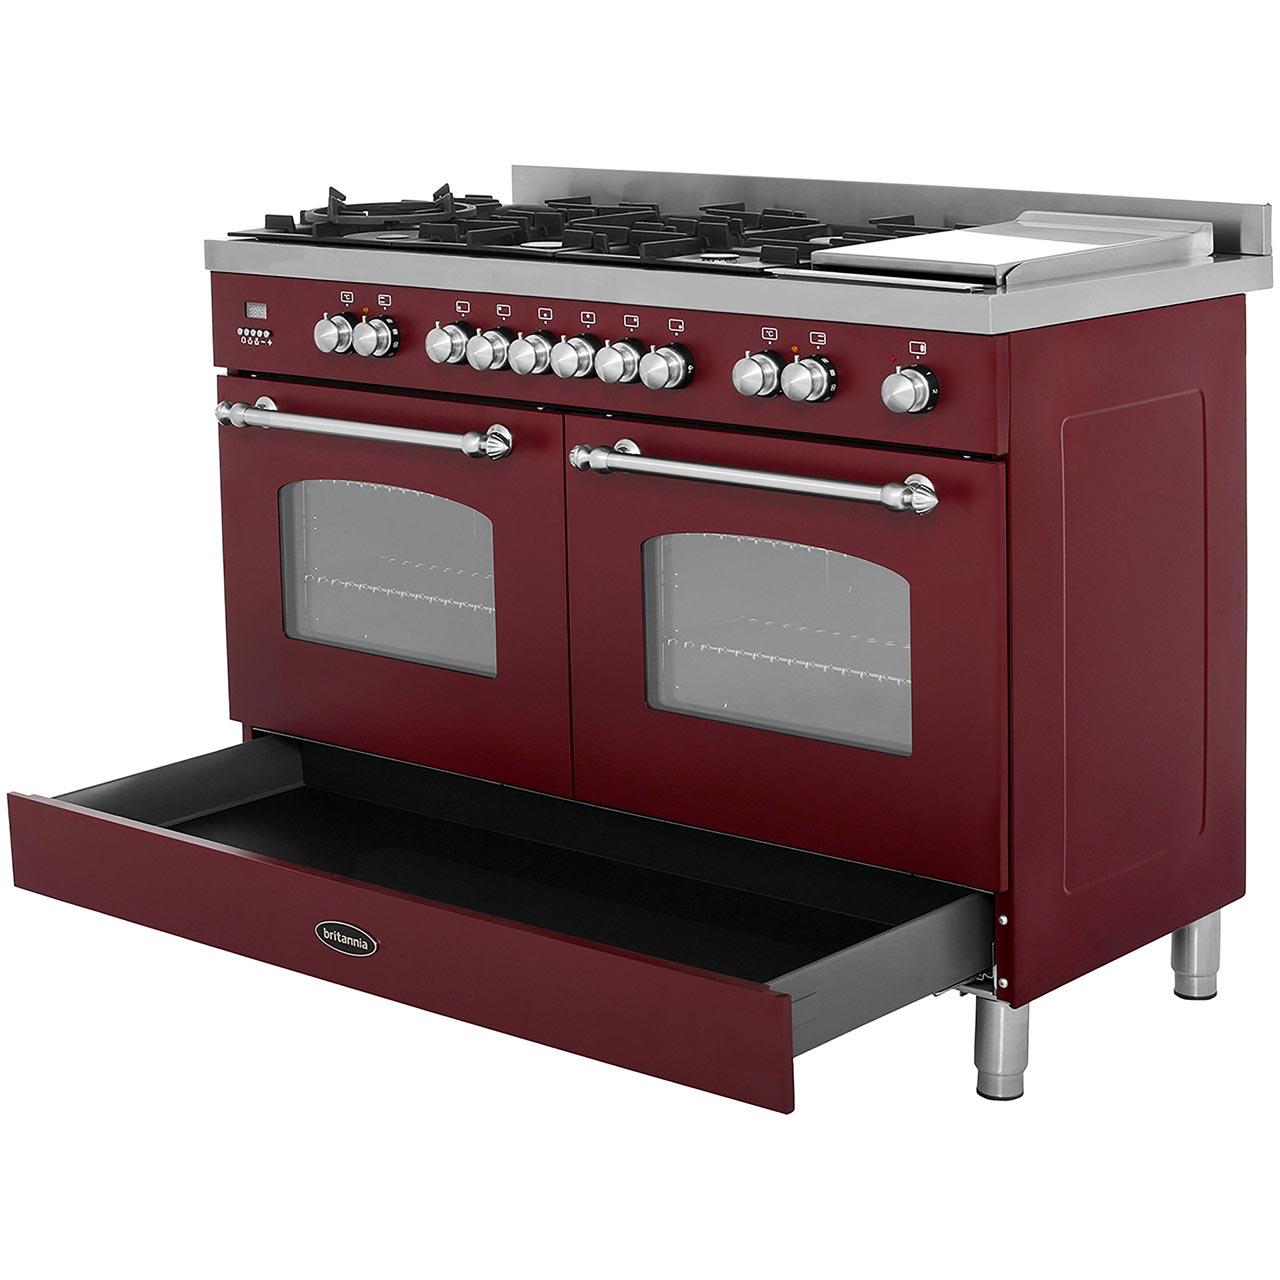 Boots Kitchen Appliances Warranty